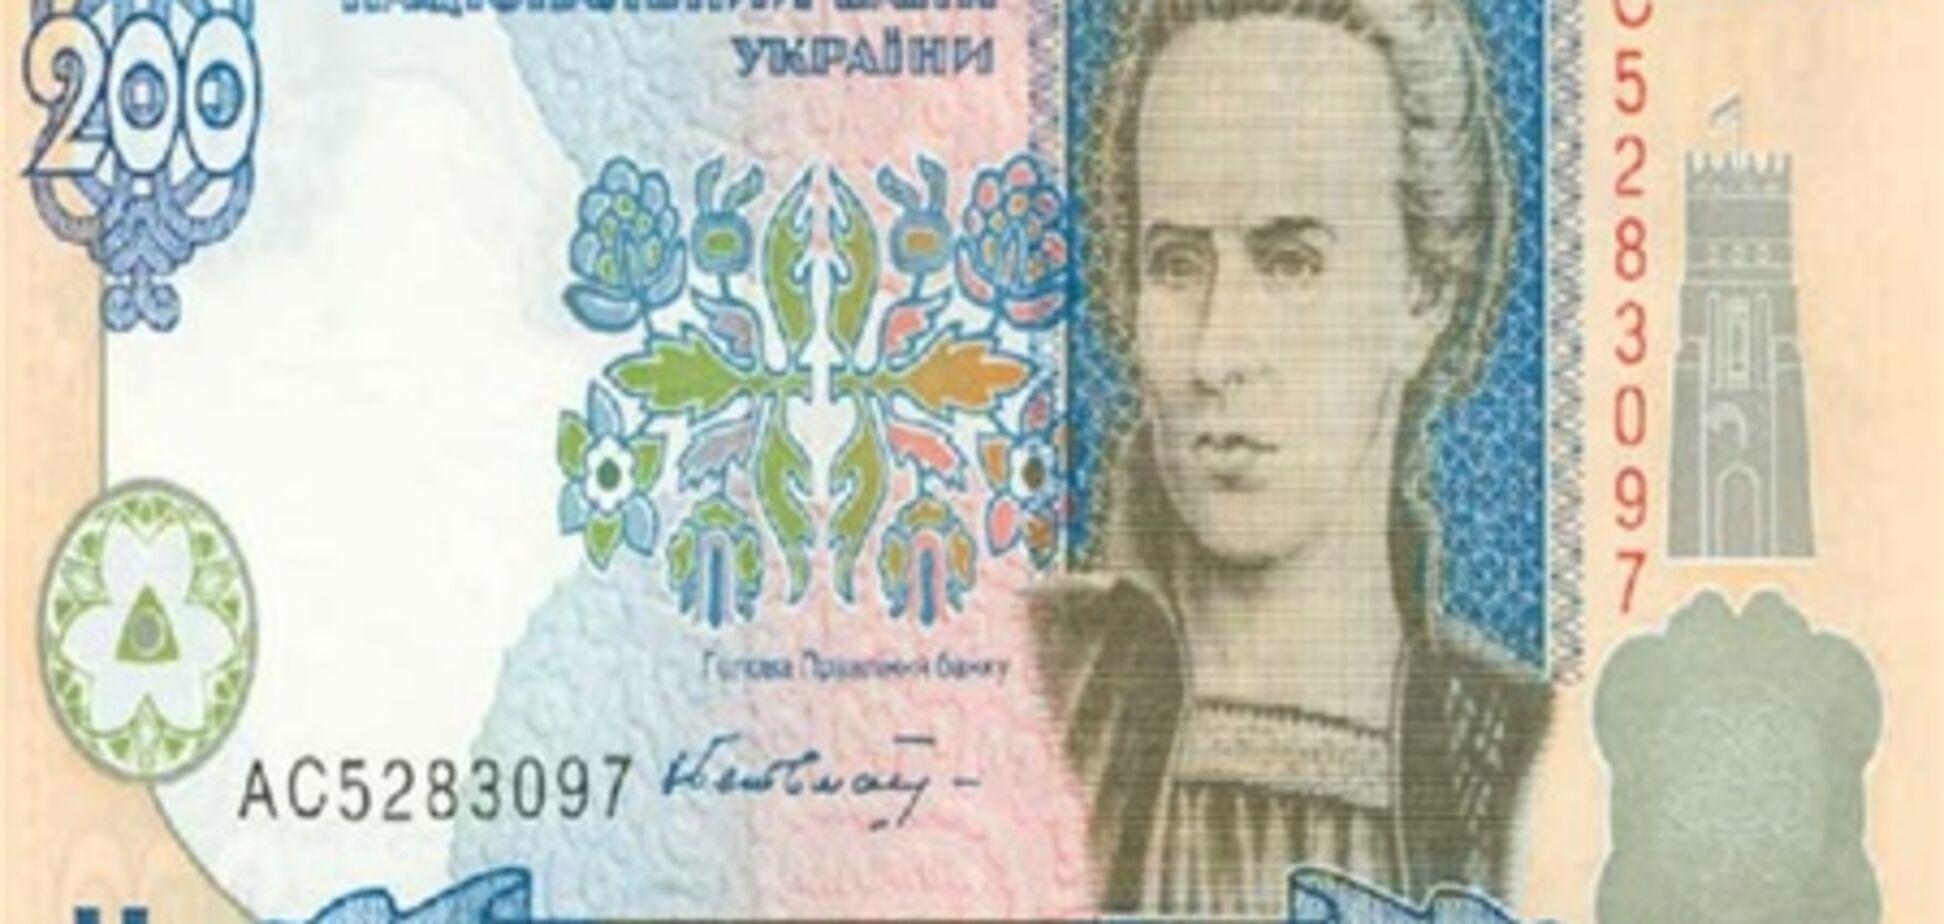 Фальшиві двохсотки продавали по 70 гривень